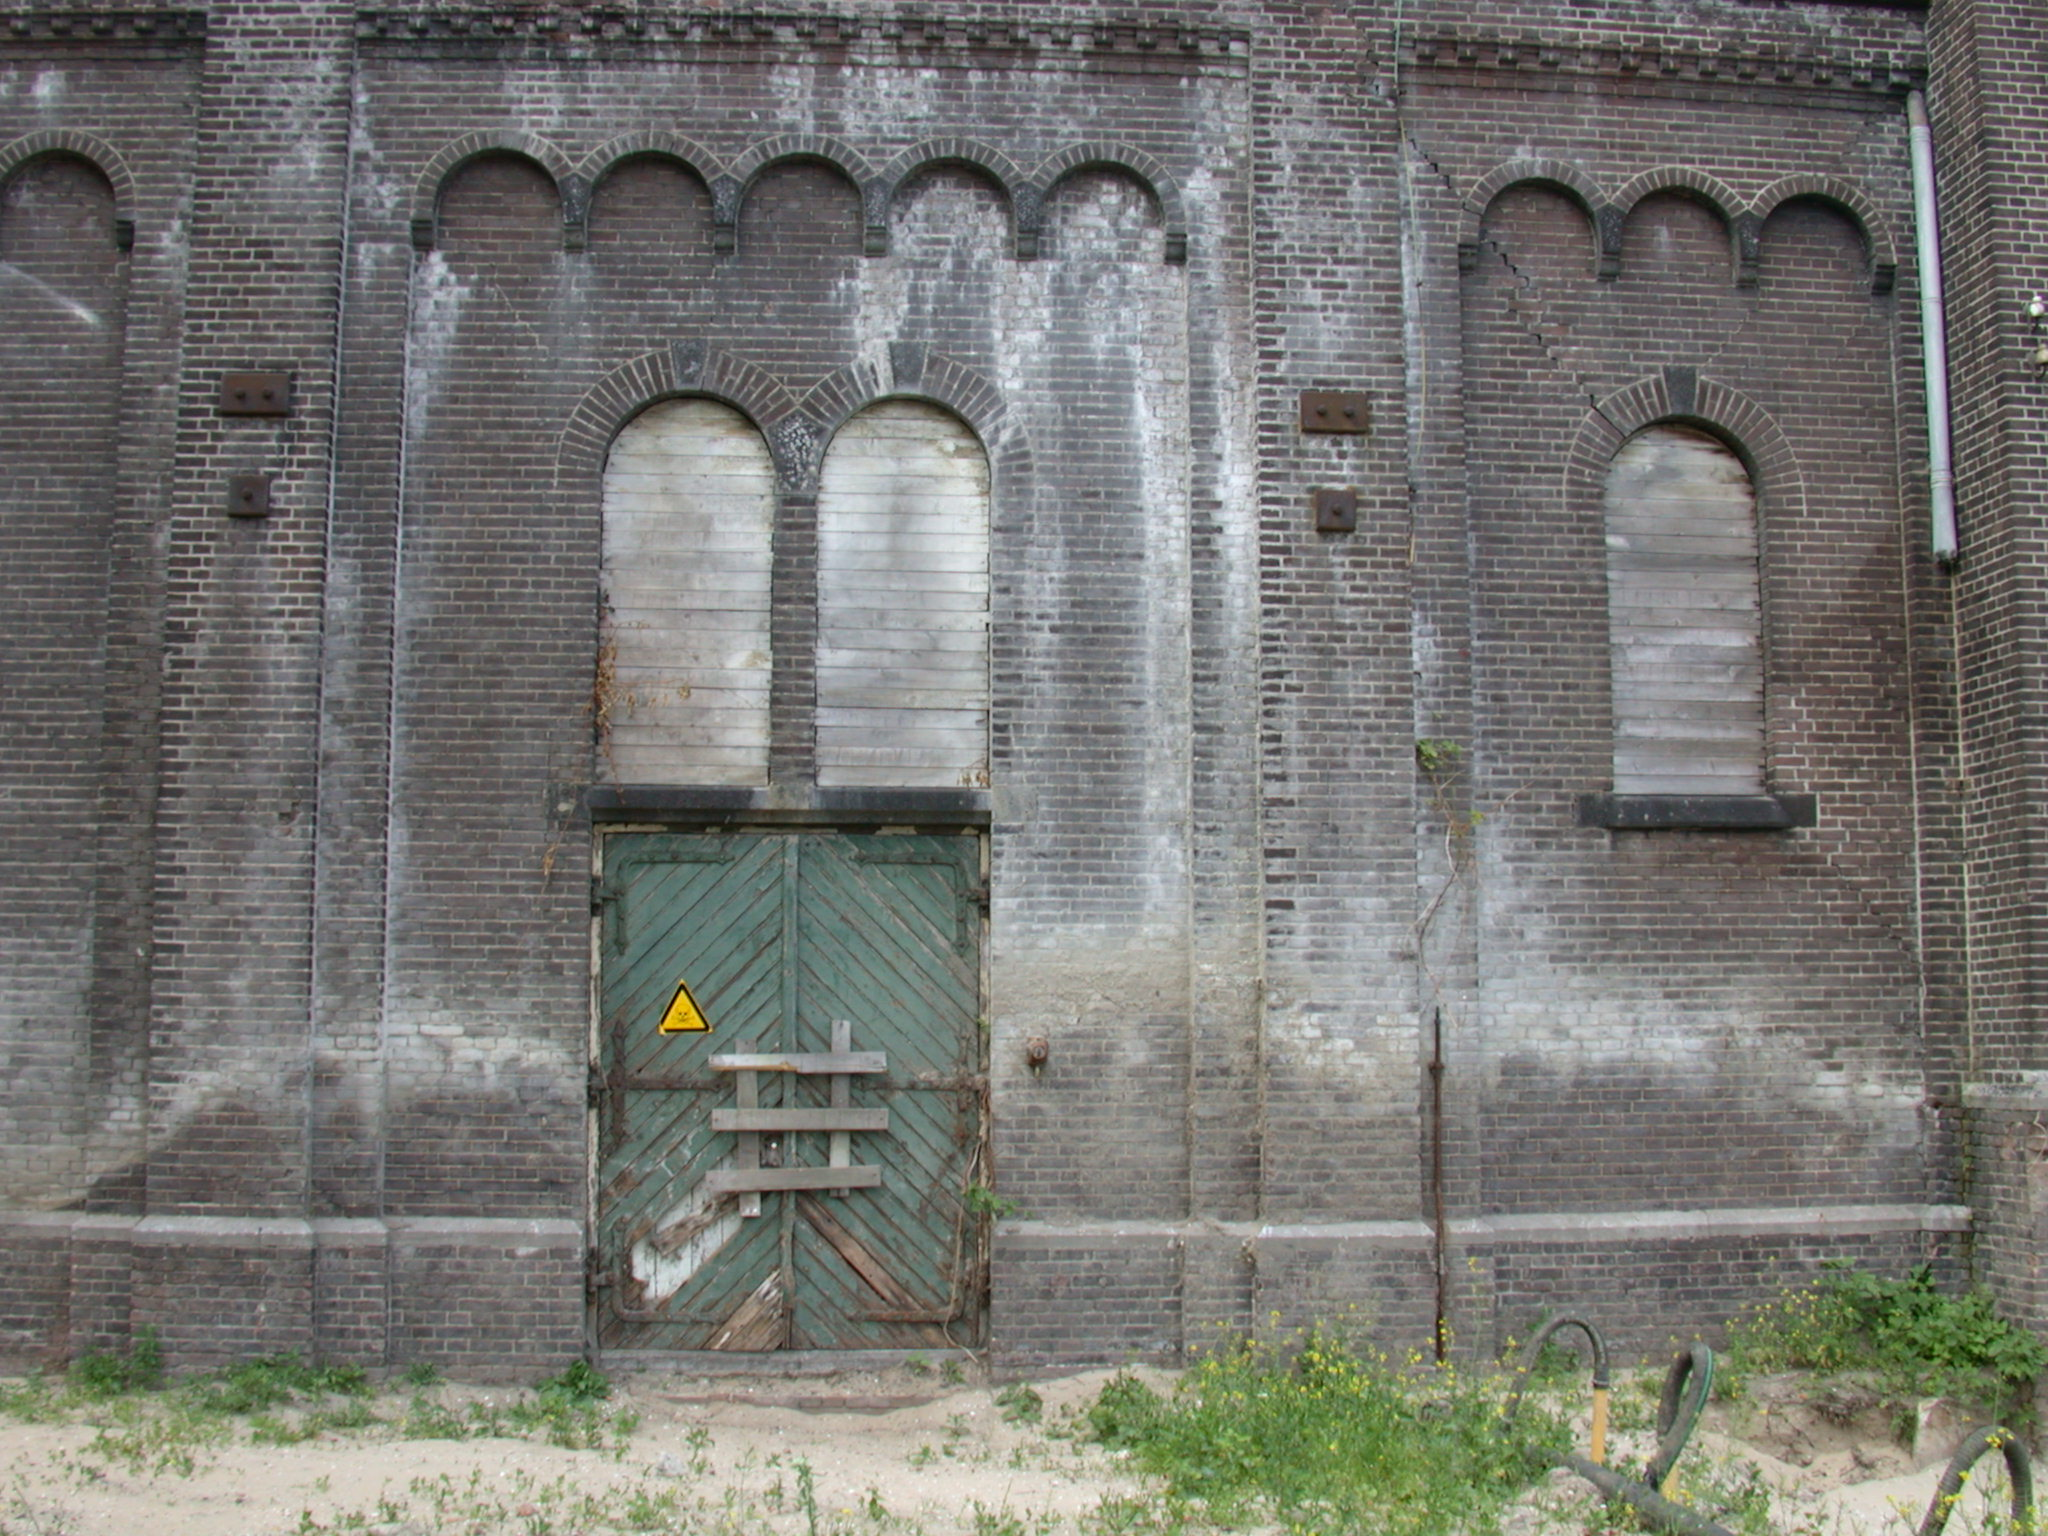 old factory gotham city walls high bricks abandoned closed baorded up windows planks derilict